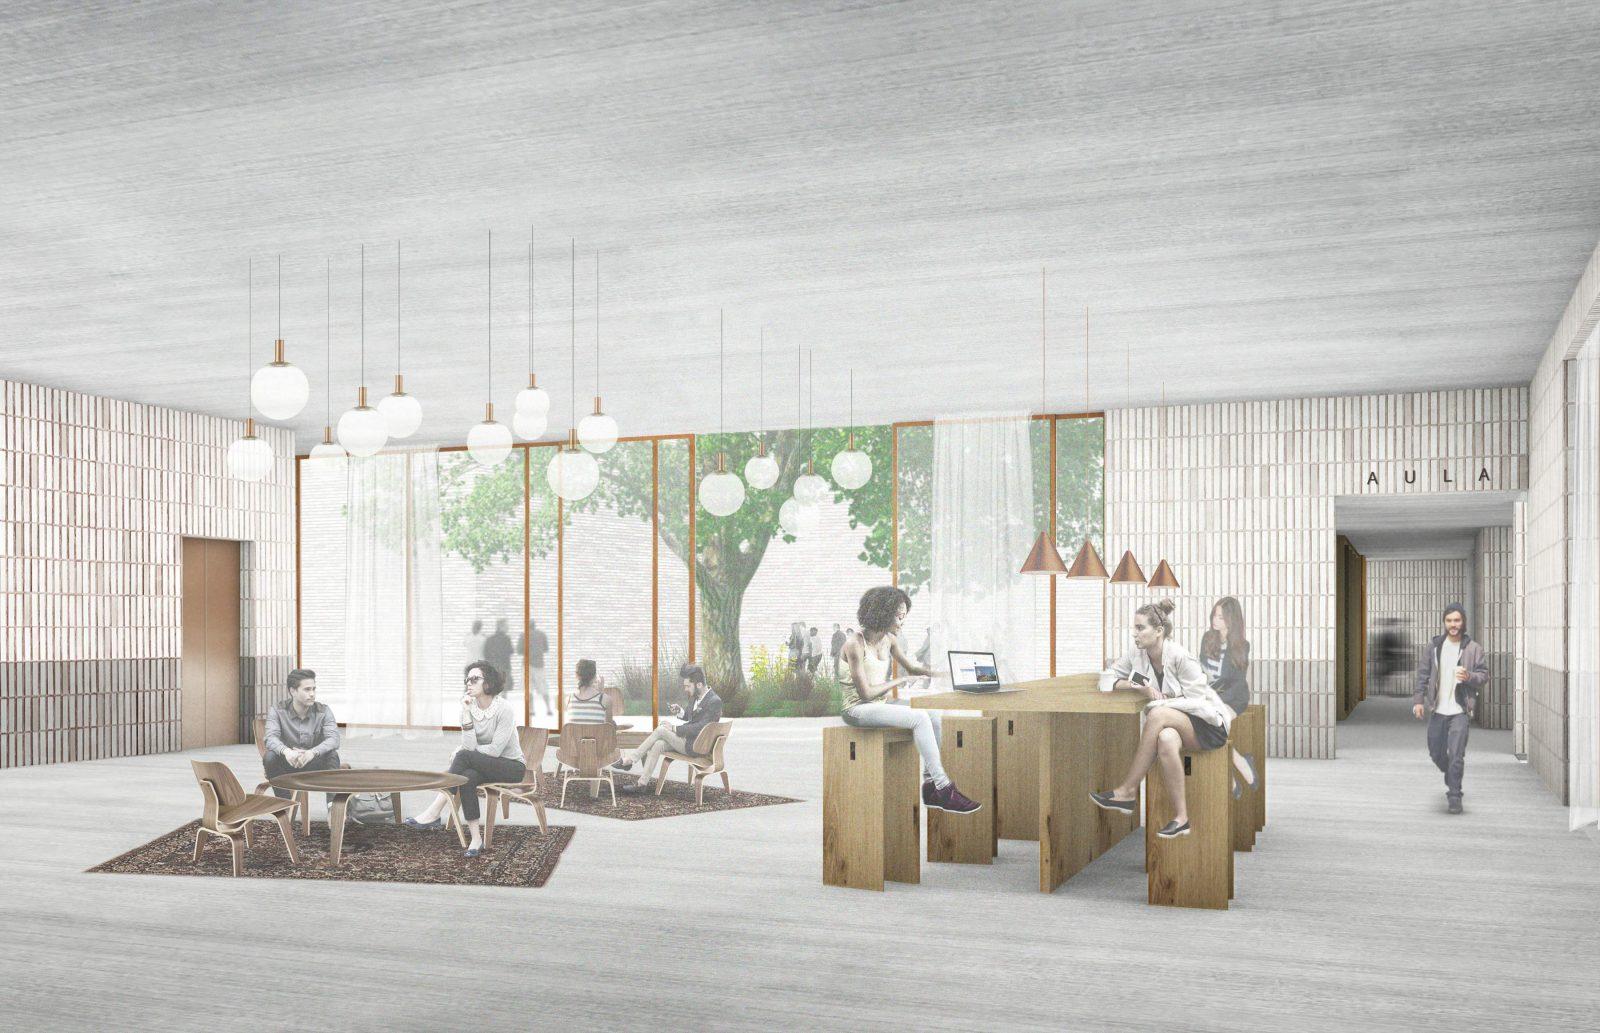 KjellanderSjöberg Högskolan StoraSköndal interior 3600x2324px